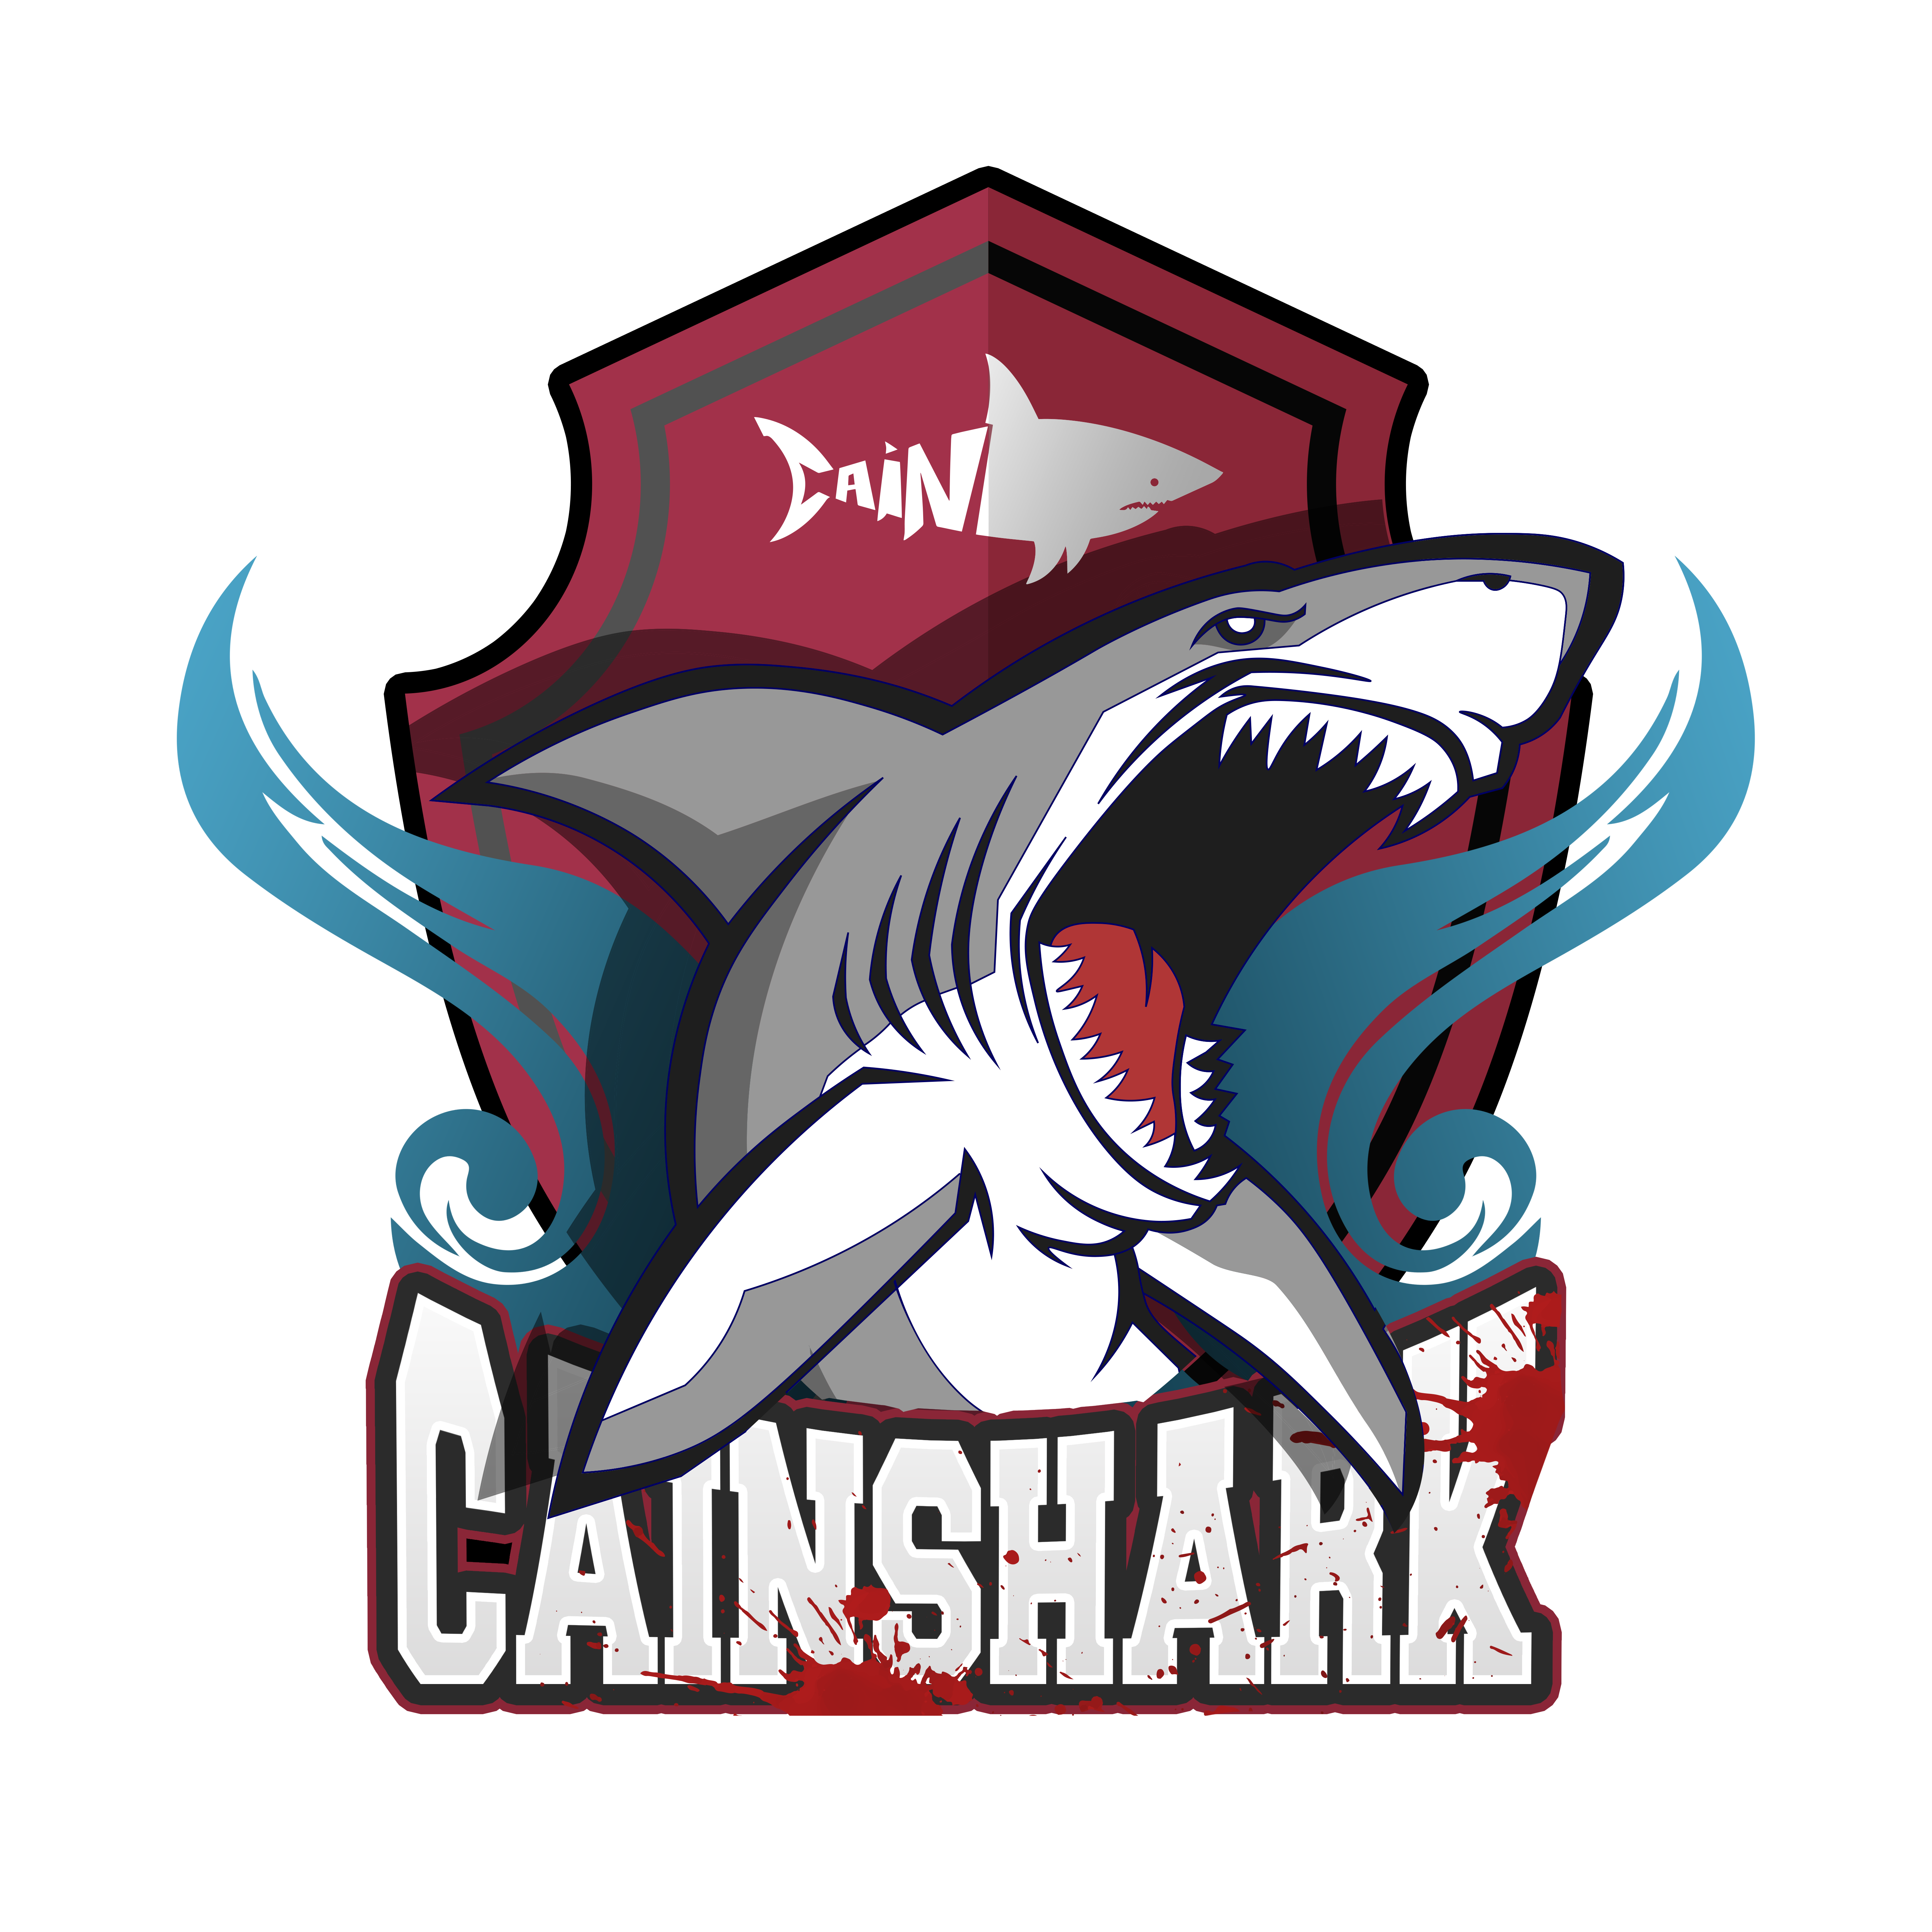 Cainshark